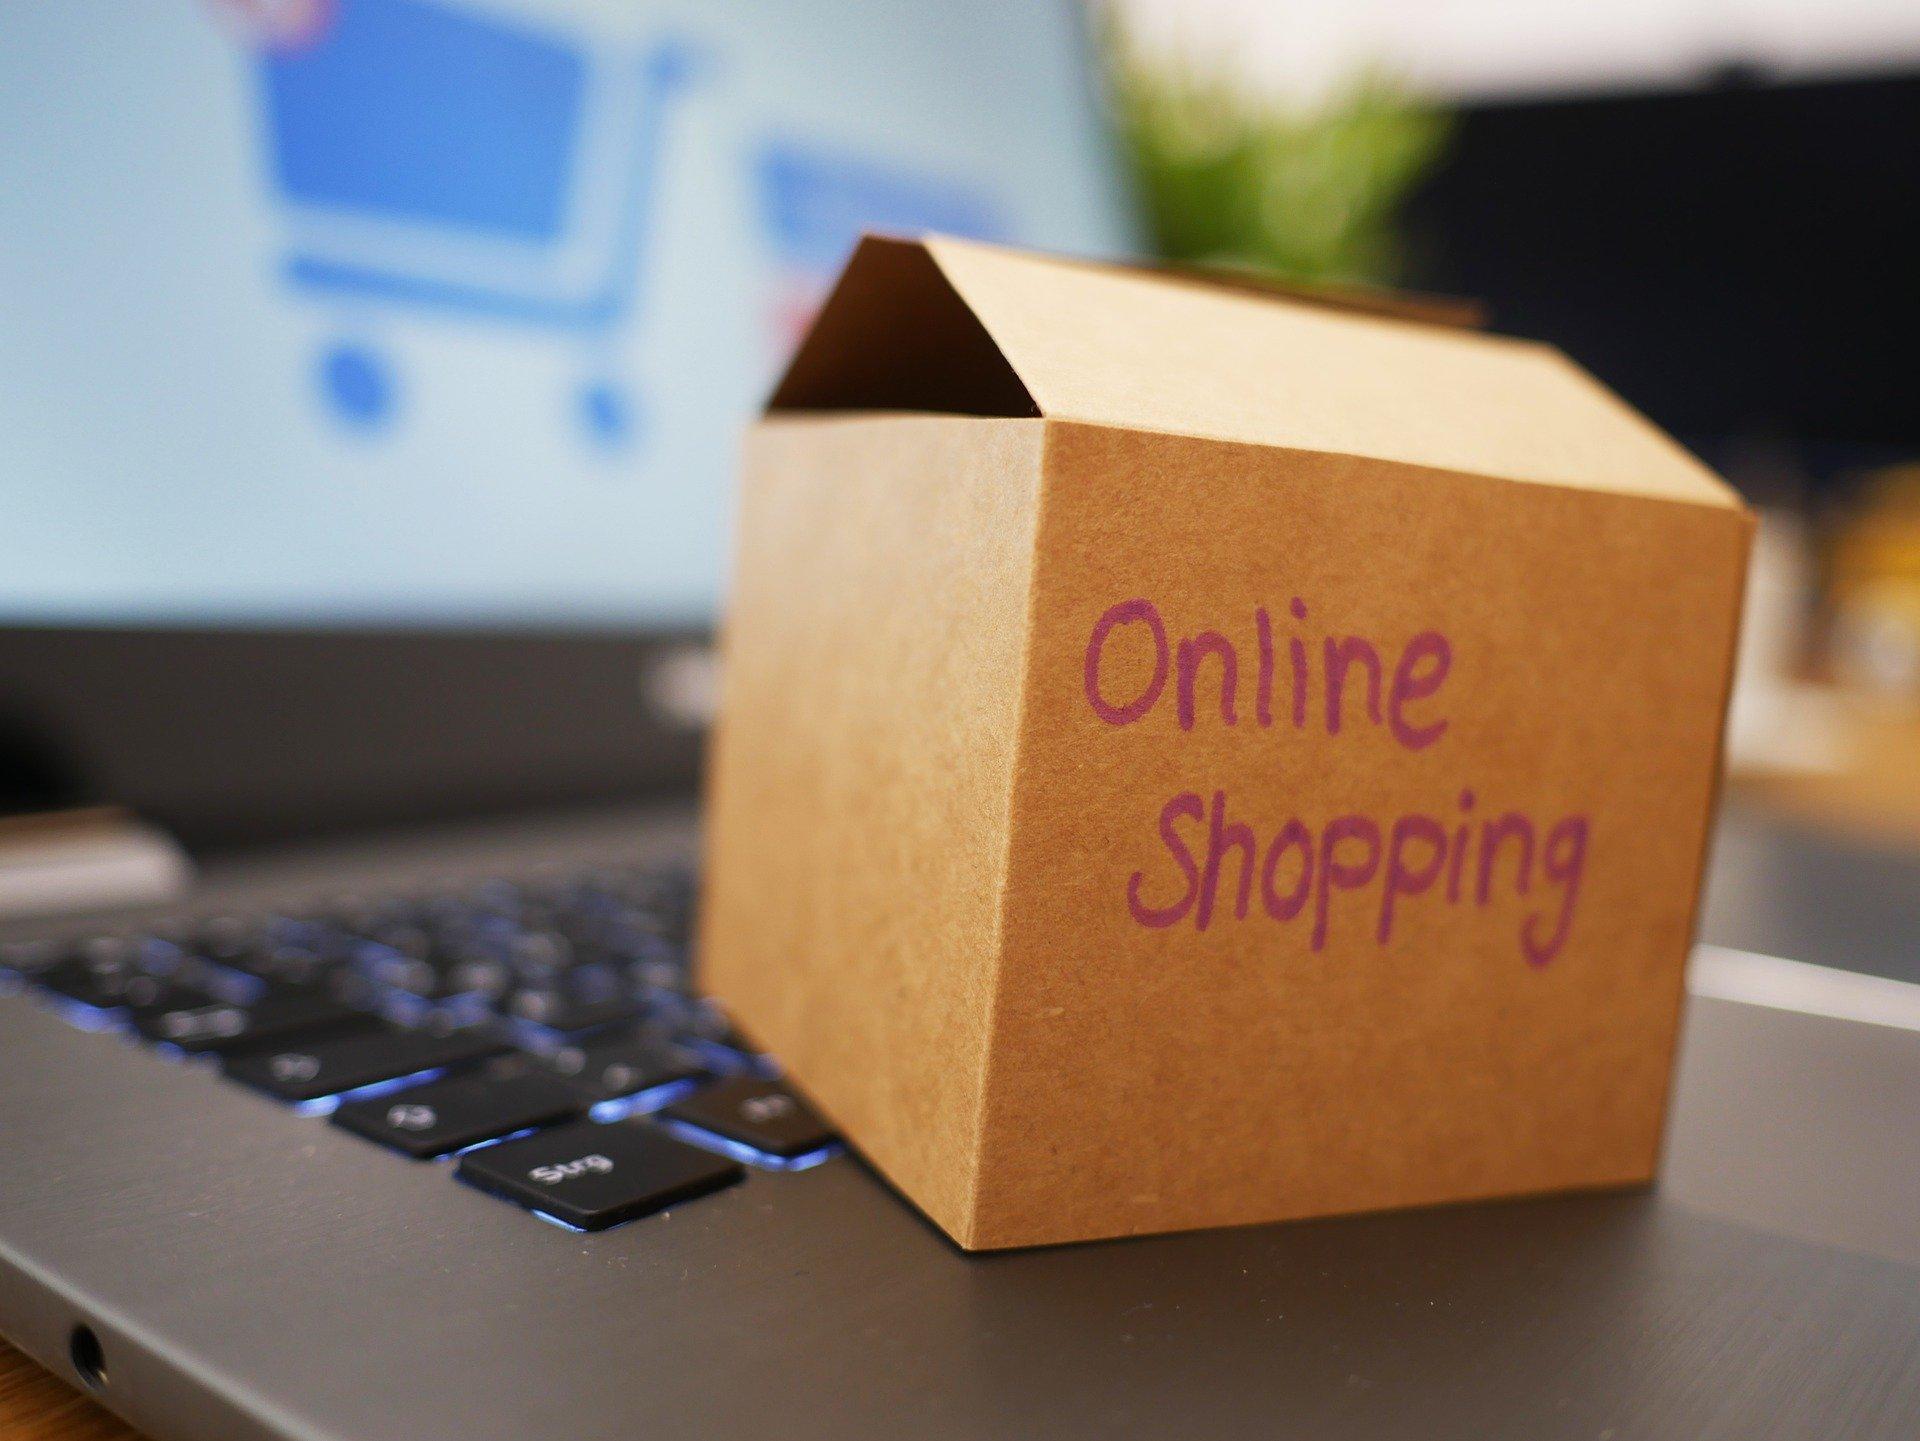 sklep internetowy dropshipping